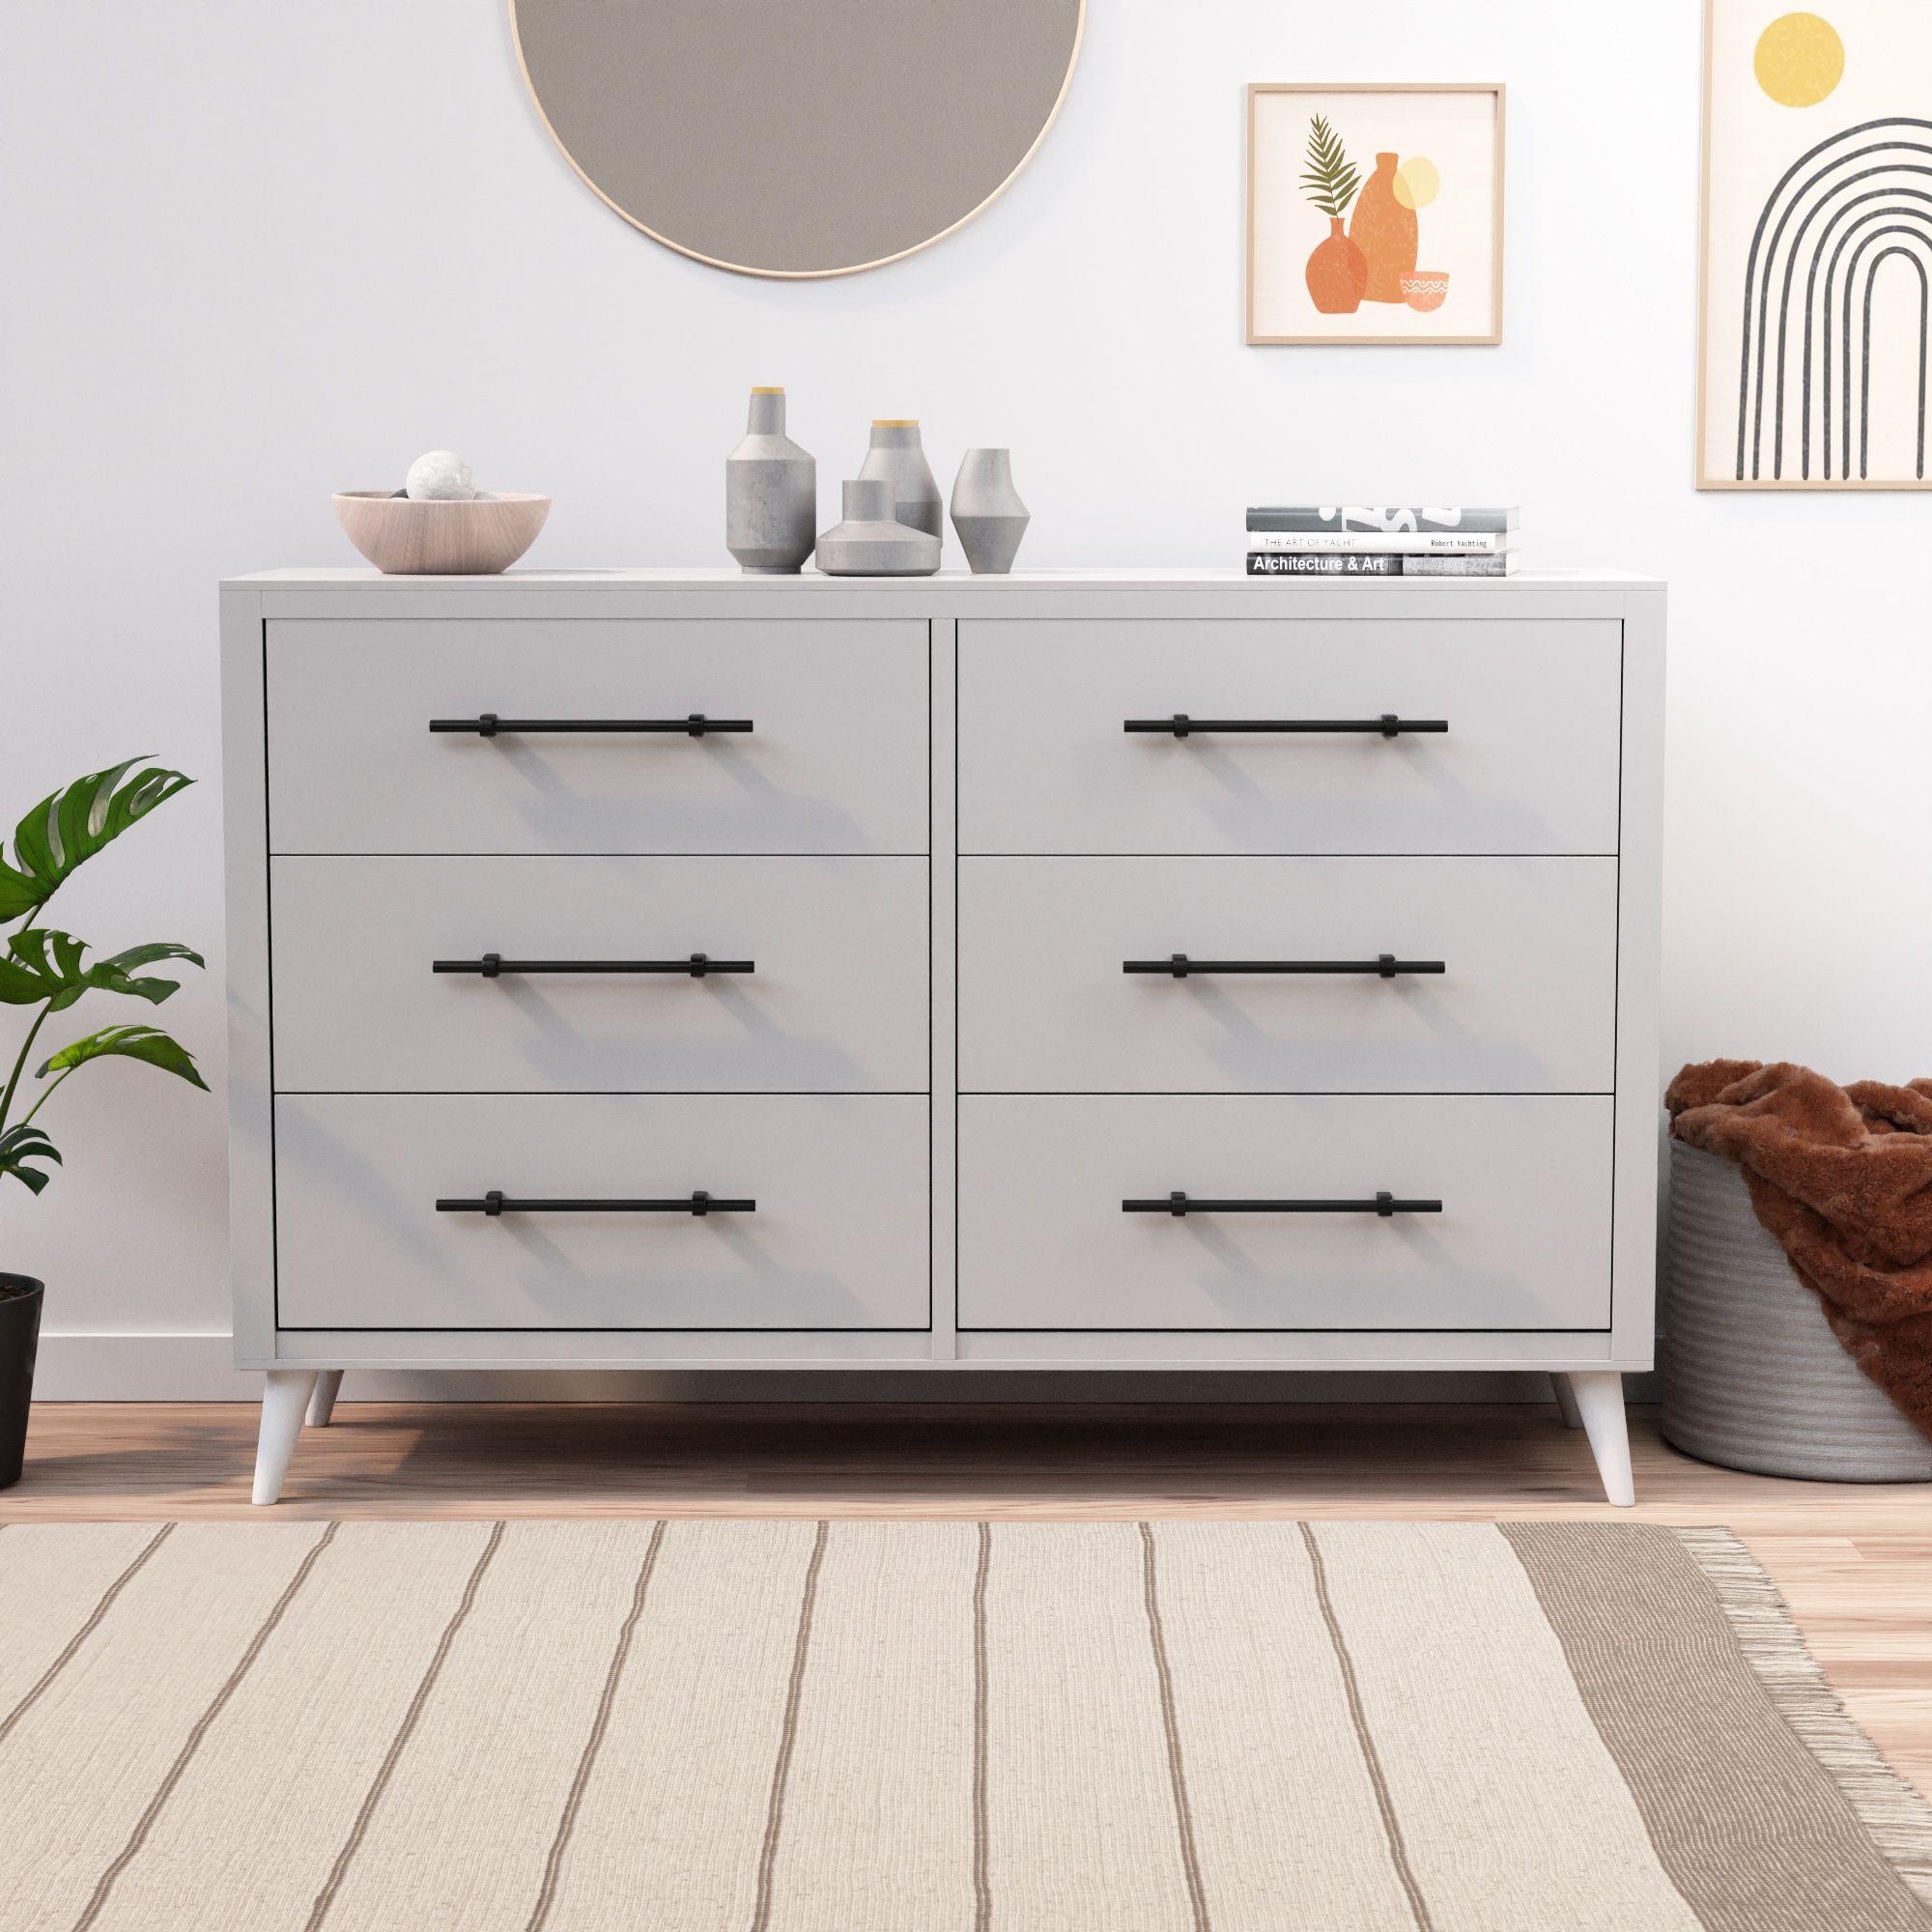 Rest Haven Mid Century Modern 6 Drawer Dresser White Walmart Com In 2021 Dresser Drawers Bedroom Furniture Dresser 6 Drawer Dresser [ 2000 x 2000 Pixel ]